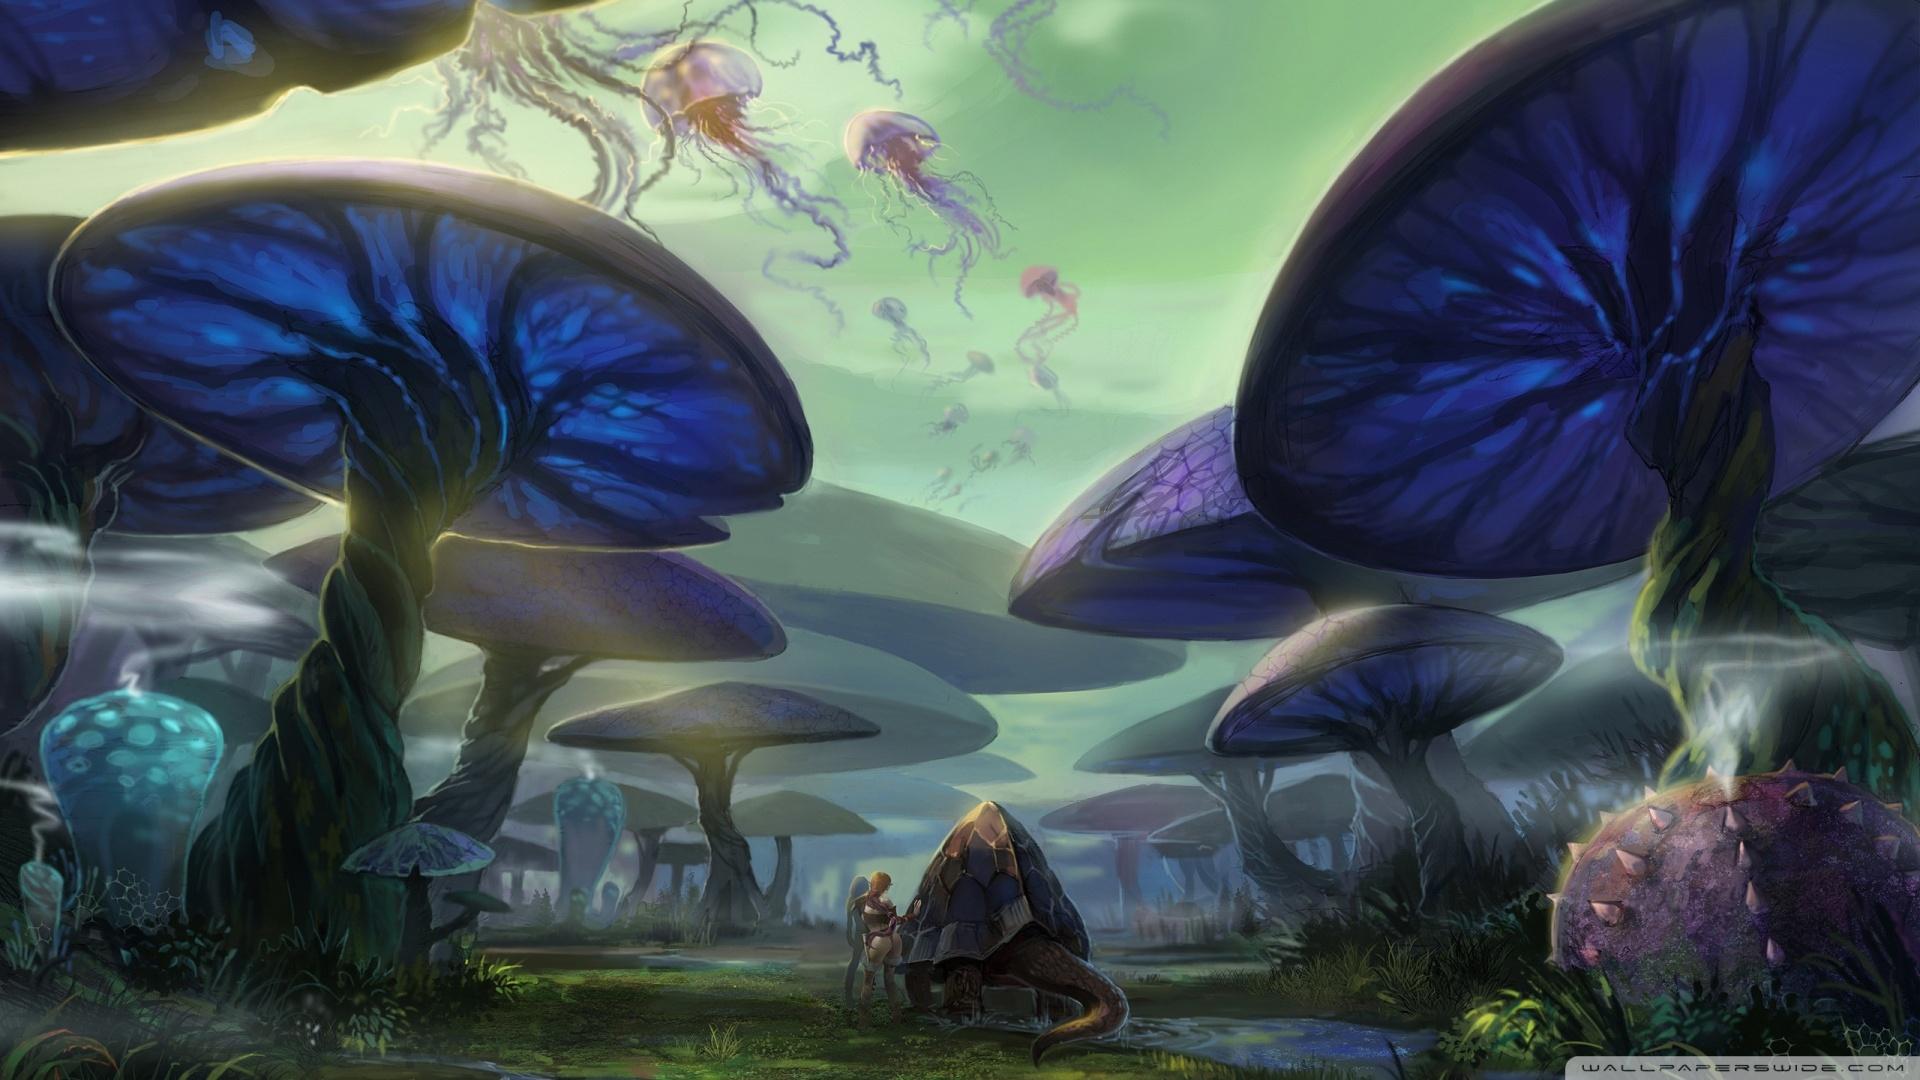 Mushroom Forest Wallpaper Wallpapersafari